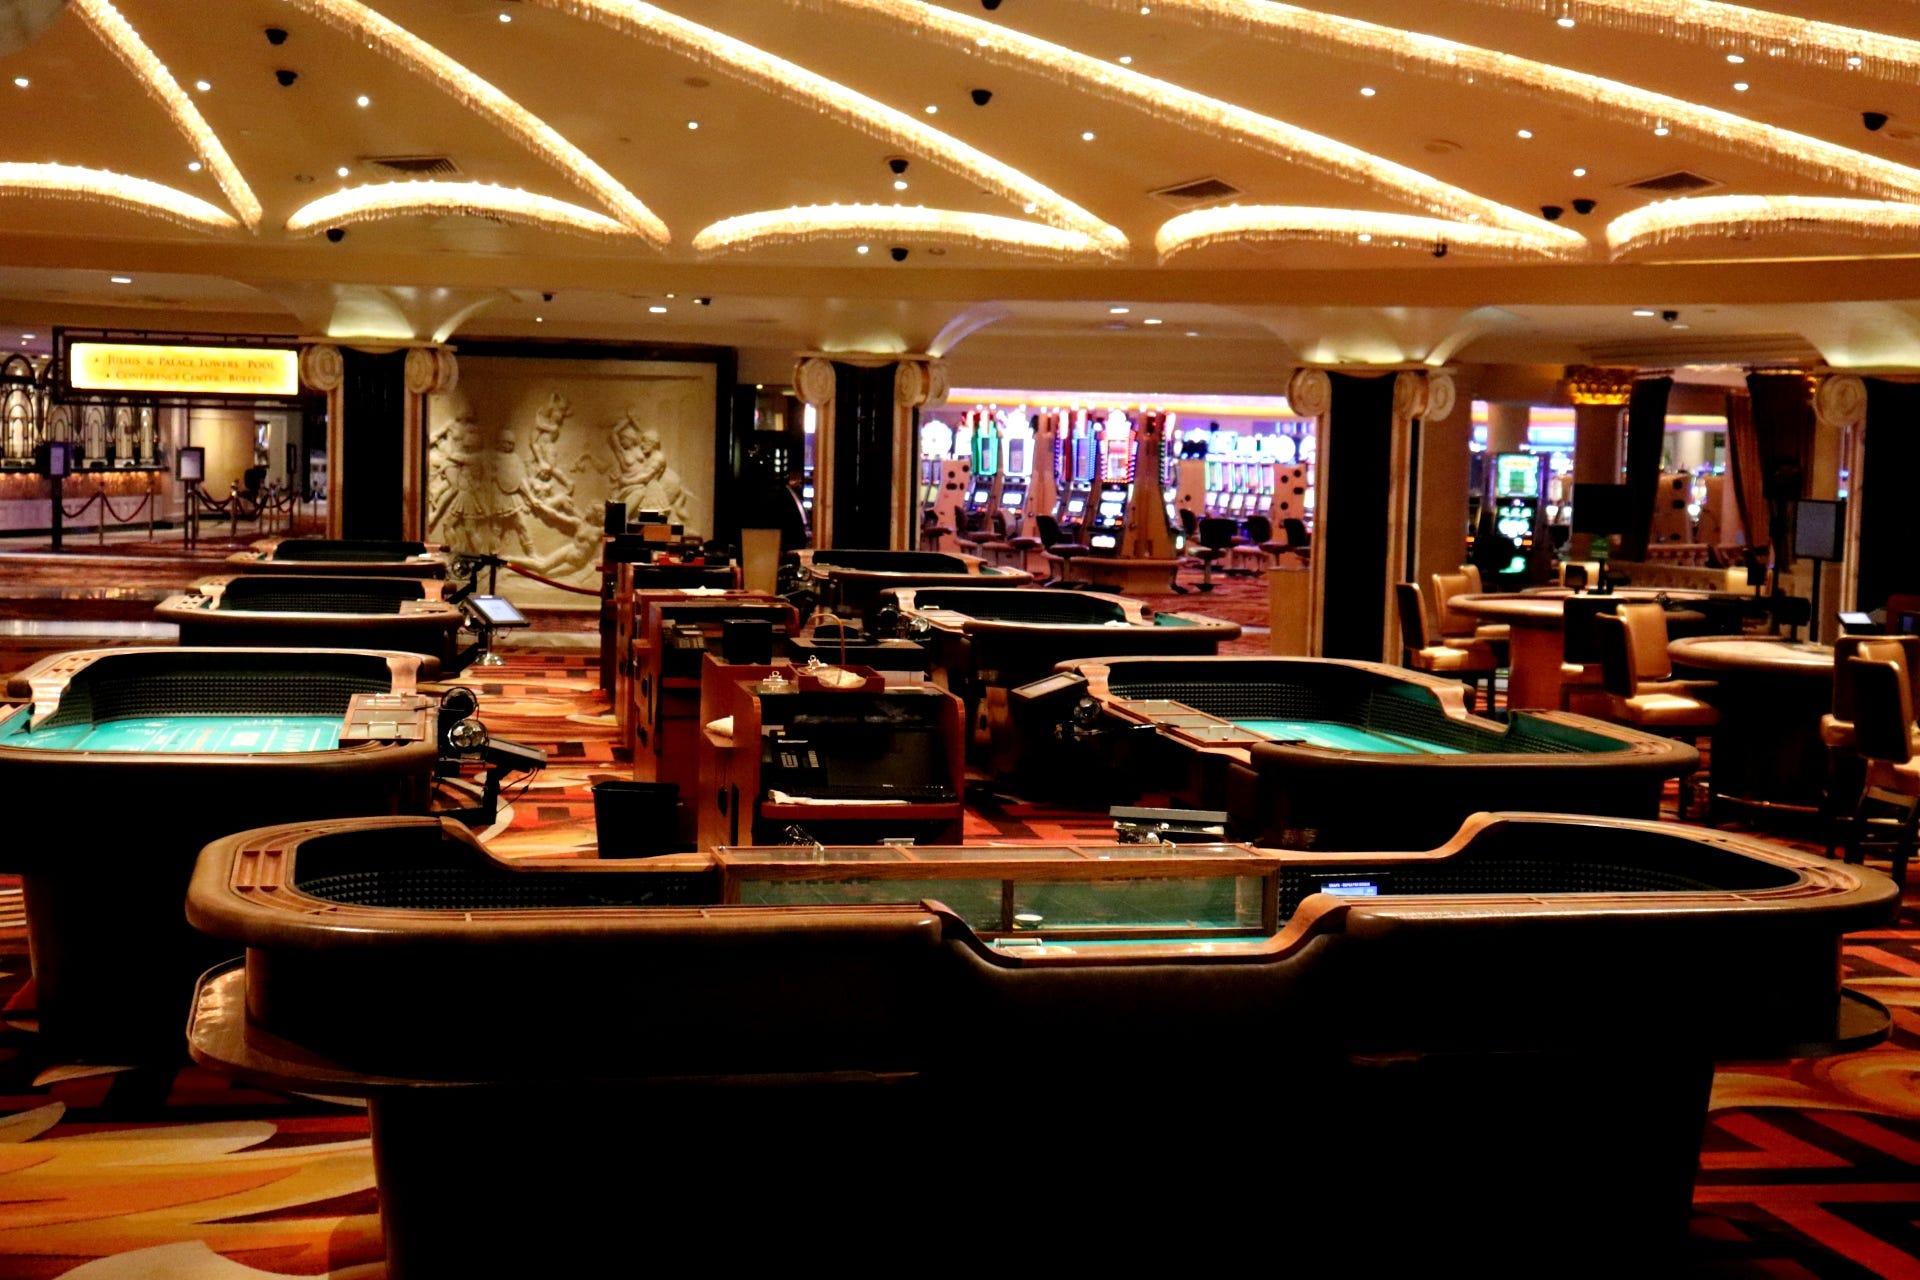 A look inside Las Vegas' empty Caesars Palace during the coronavirus pandemic